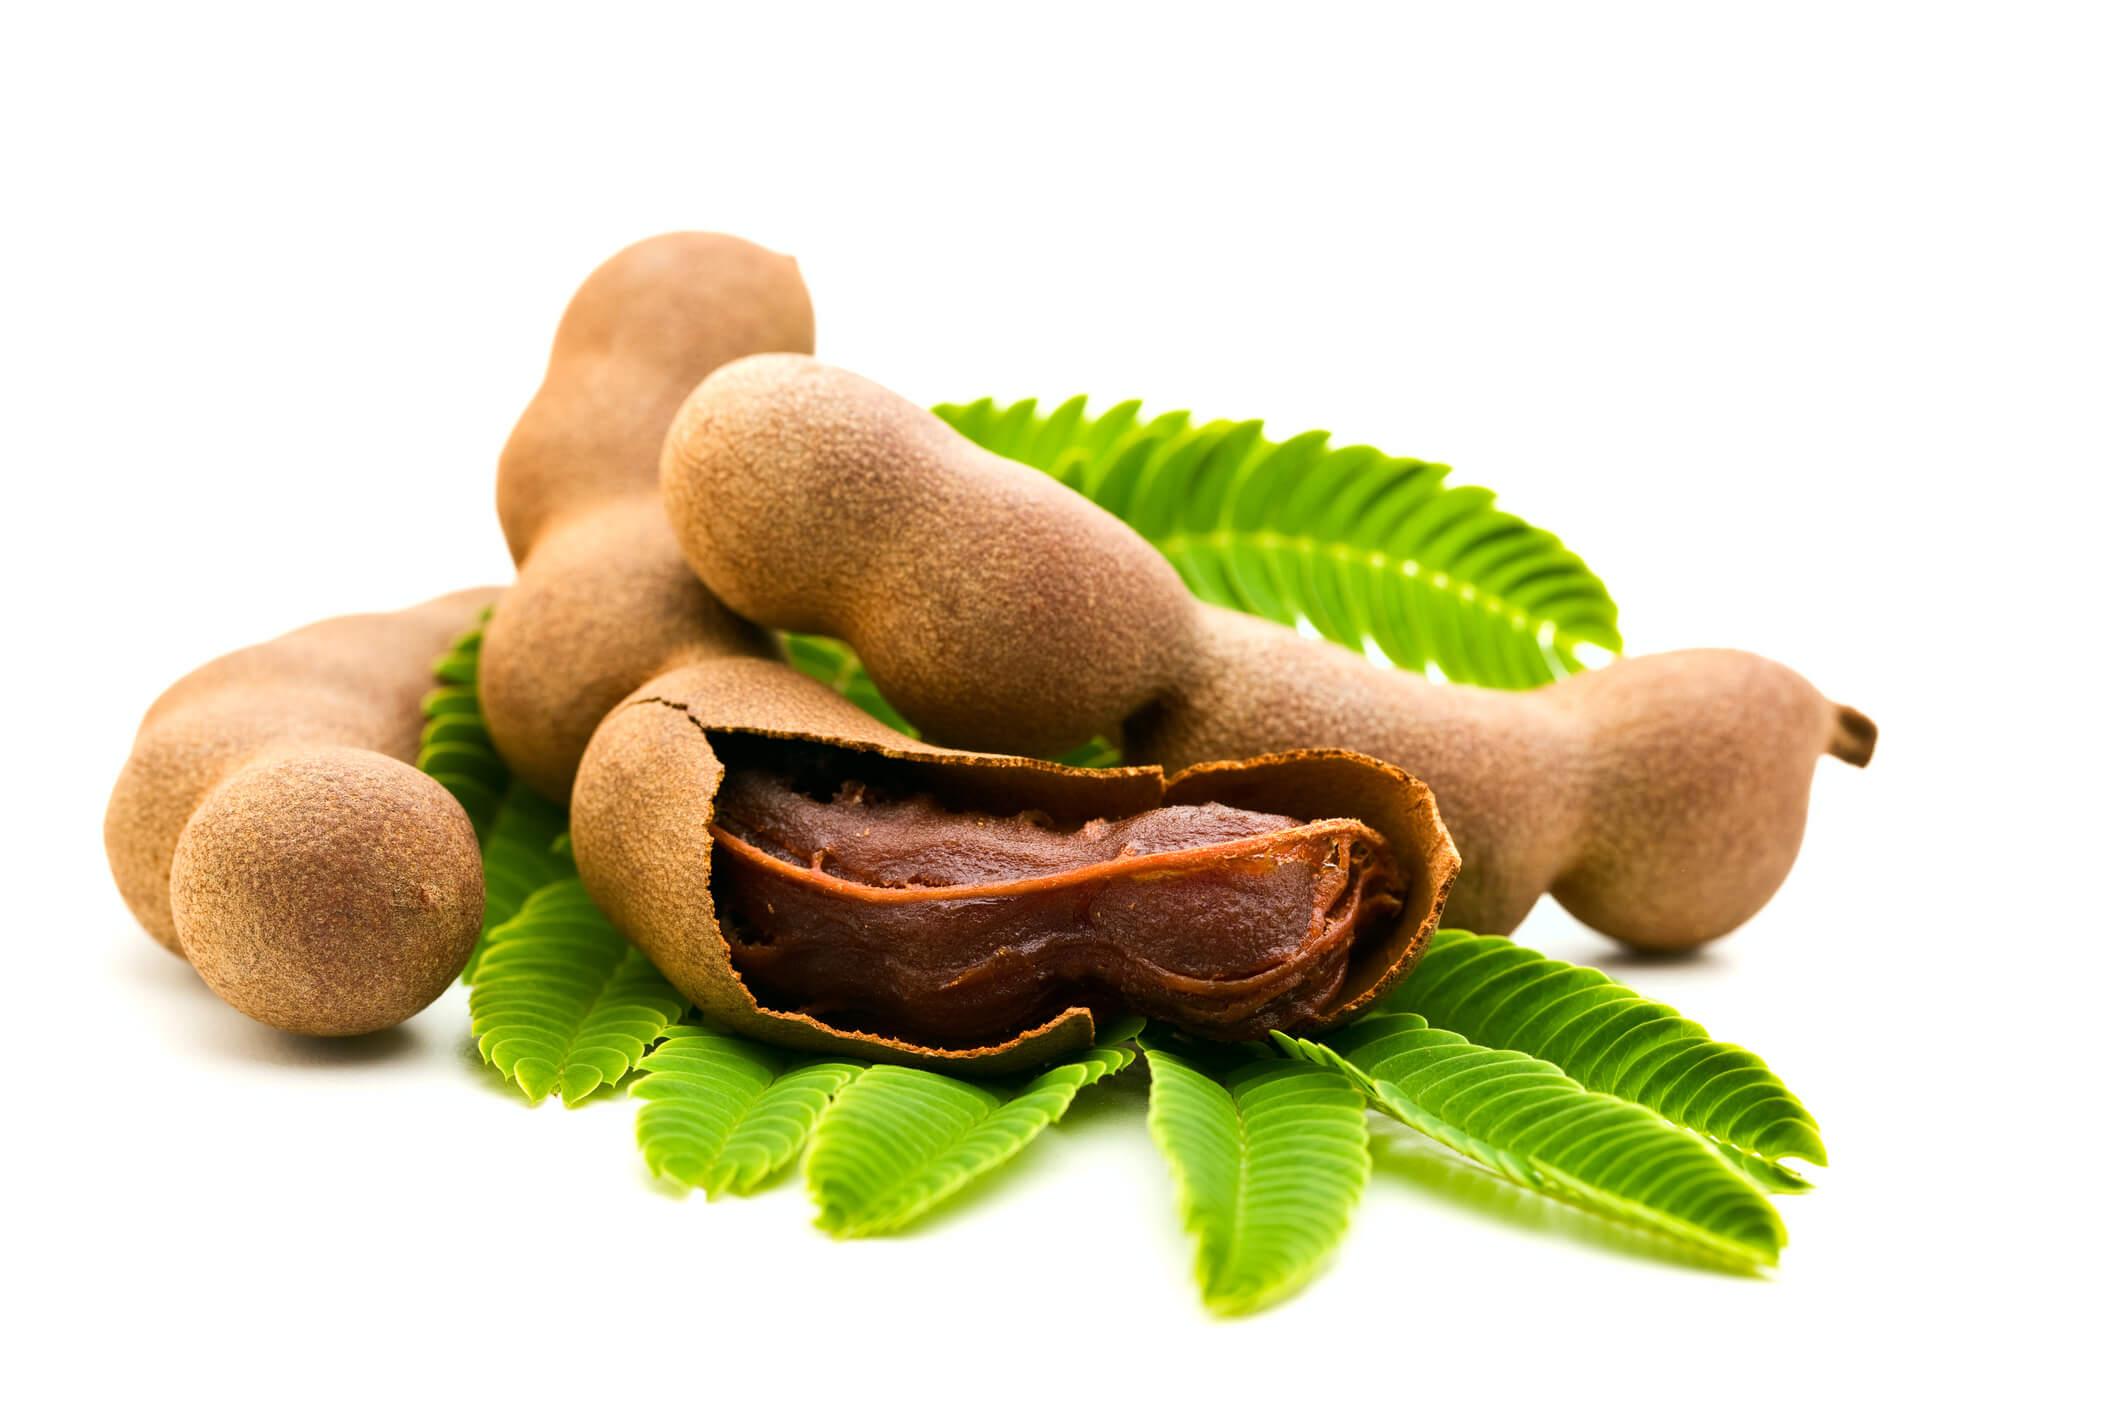 15 Thai Sour Tamarind Seeds